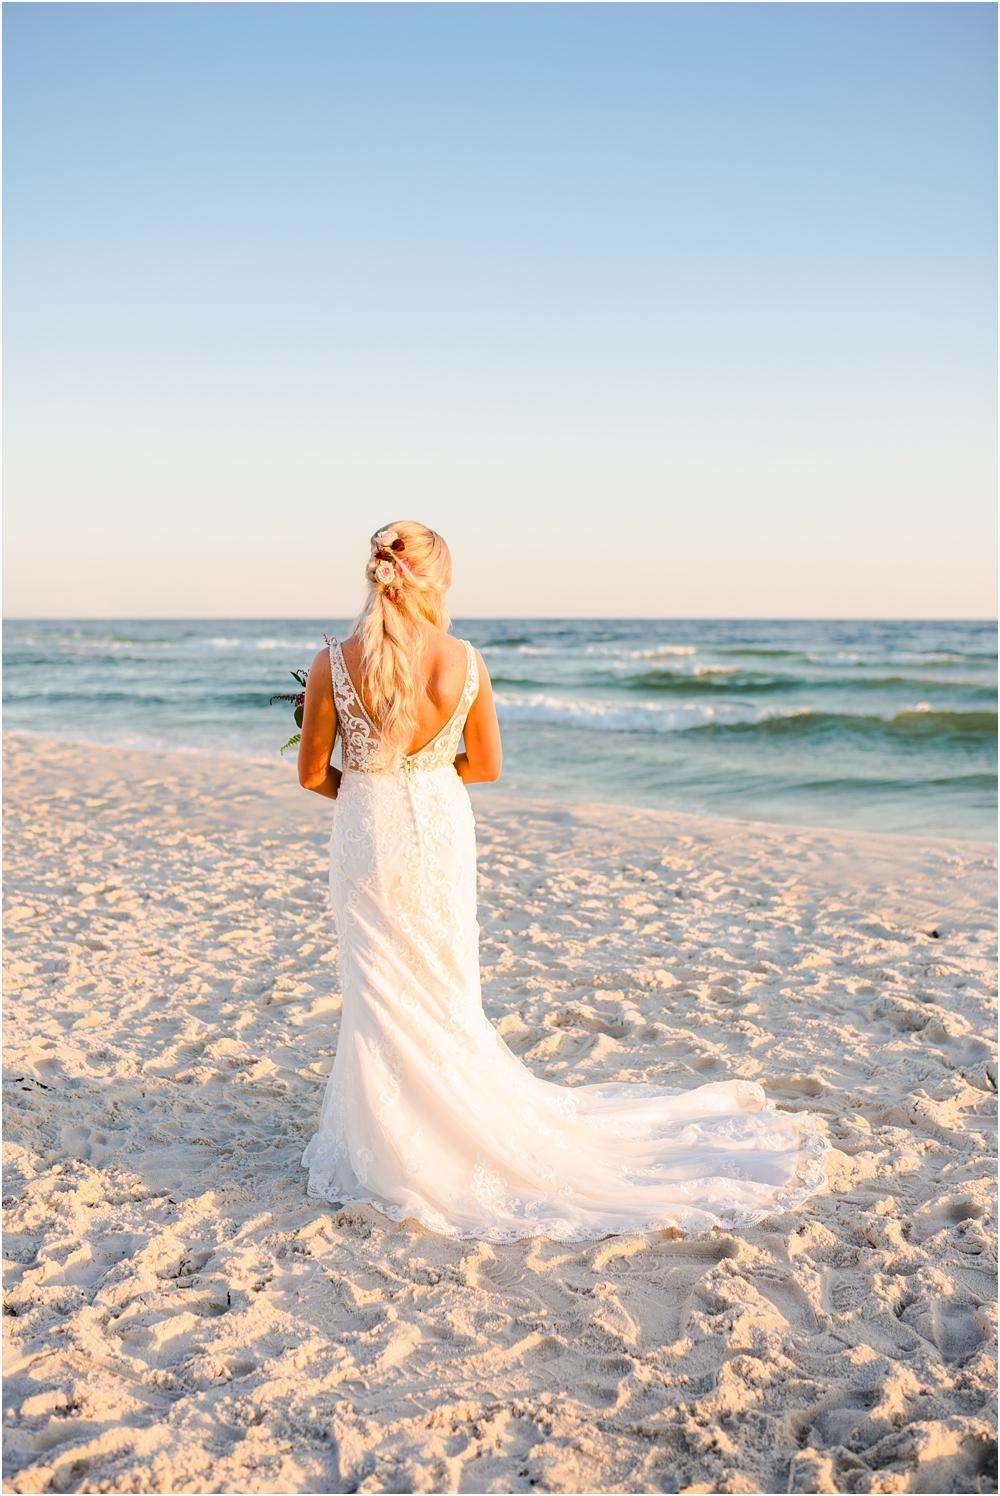 mcglothlin-wedding-kiersten-stevenson-photography-30a-panama-city-beach-dothan-tallahassee-(100-of-145).jpg